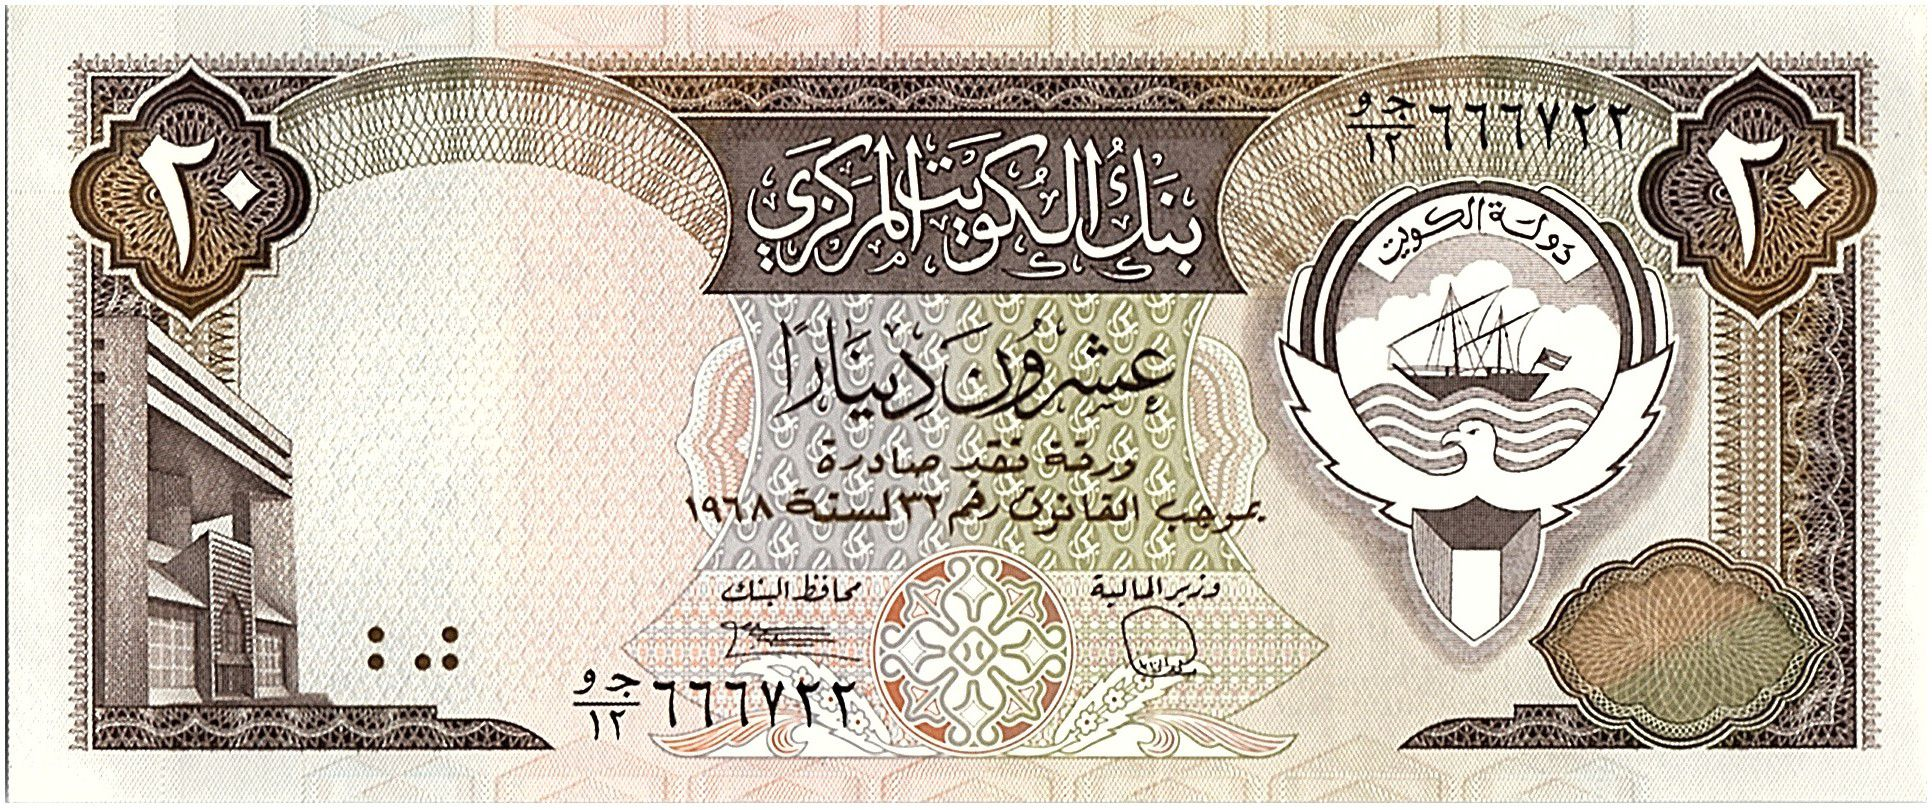 Kuwait 20 Dinars - Arms - Justice Center - 19(86-91) P.16